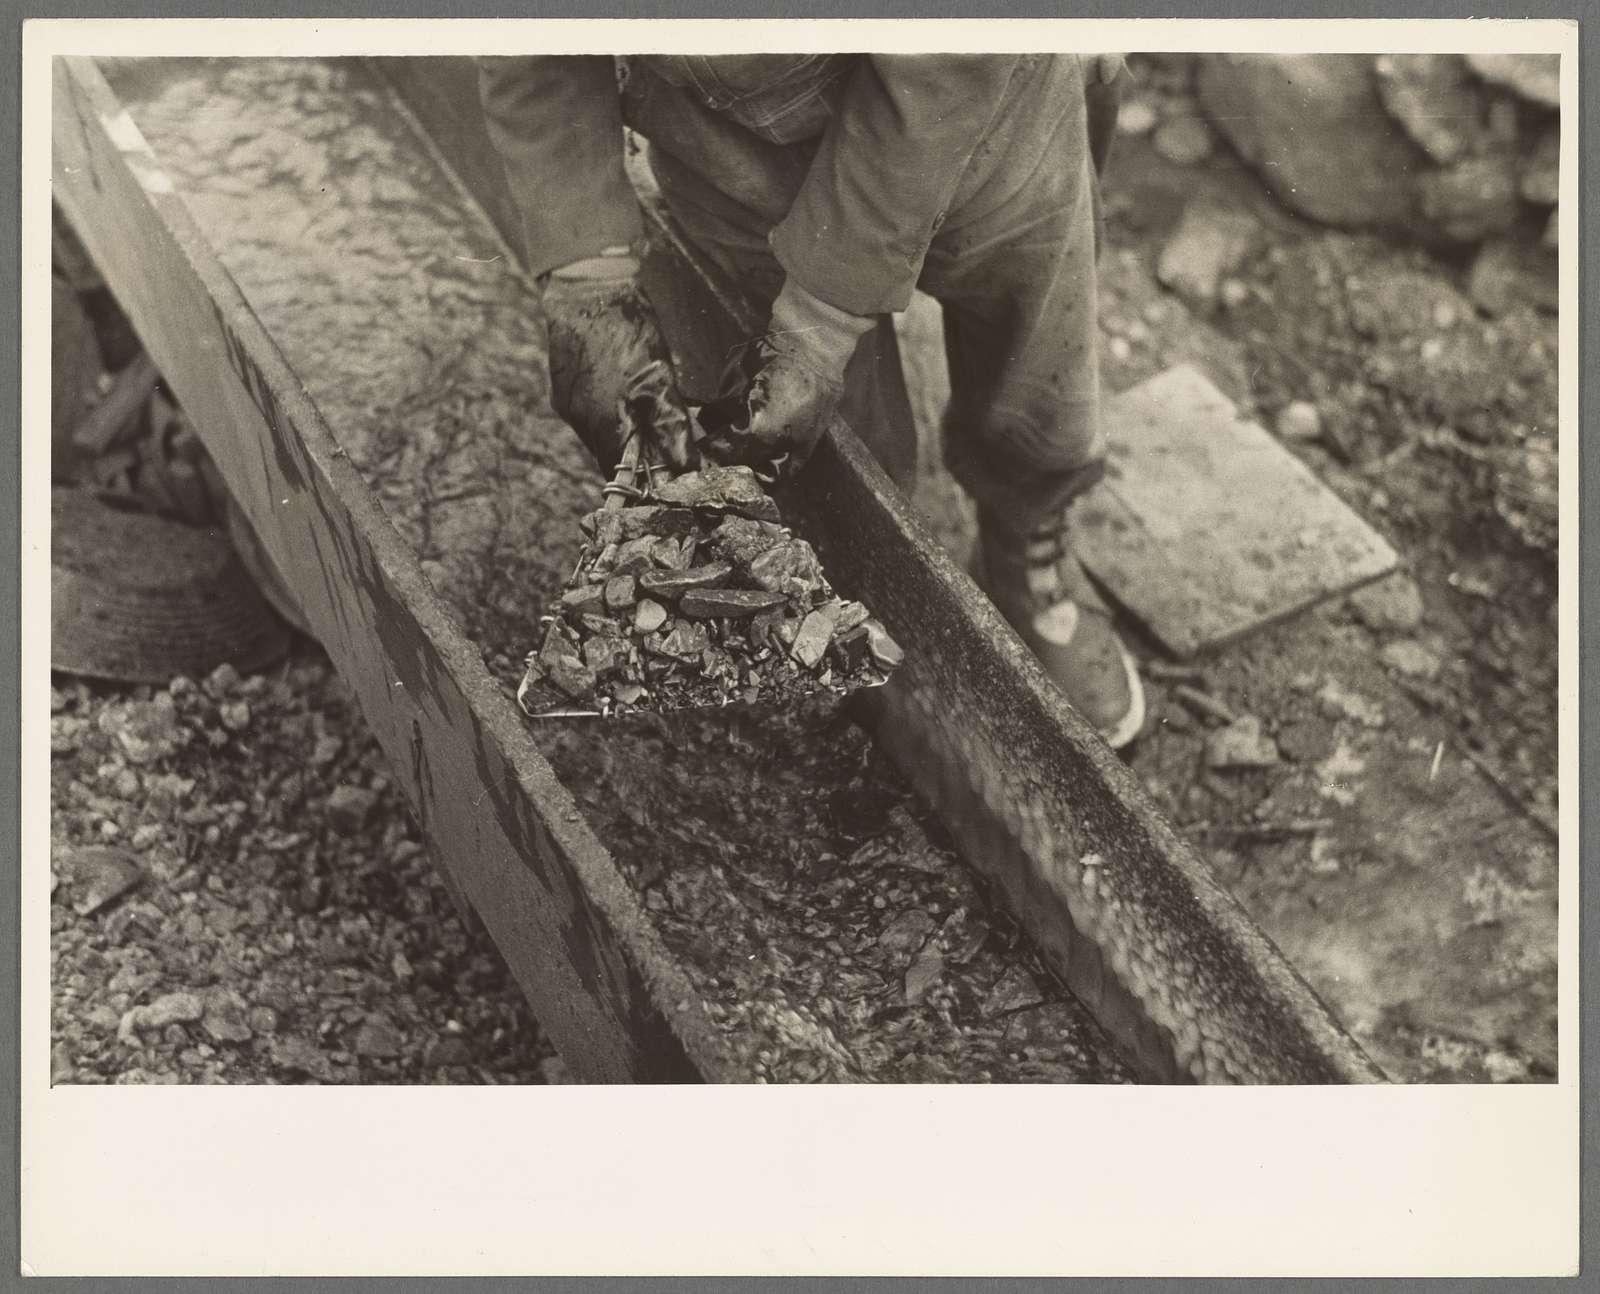 Gold miner working in sluice box, Two Bit Creek, South Dakota